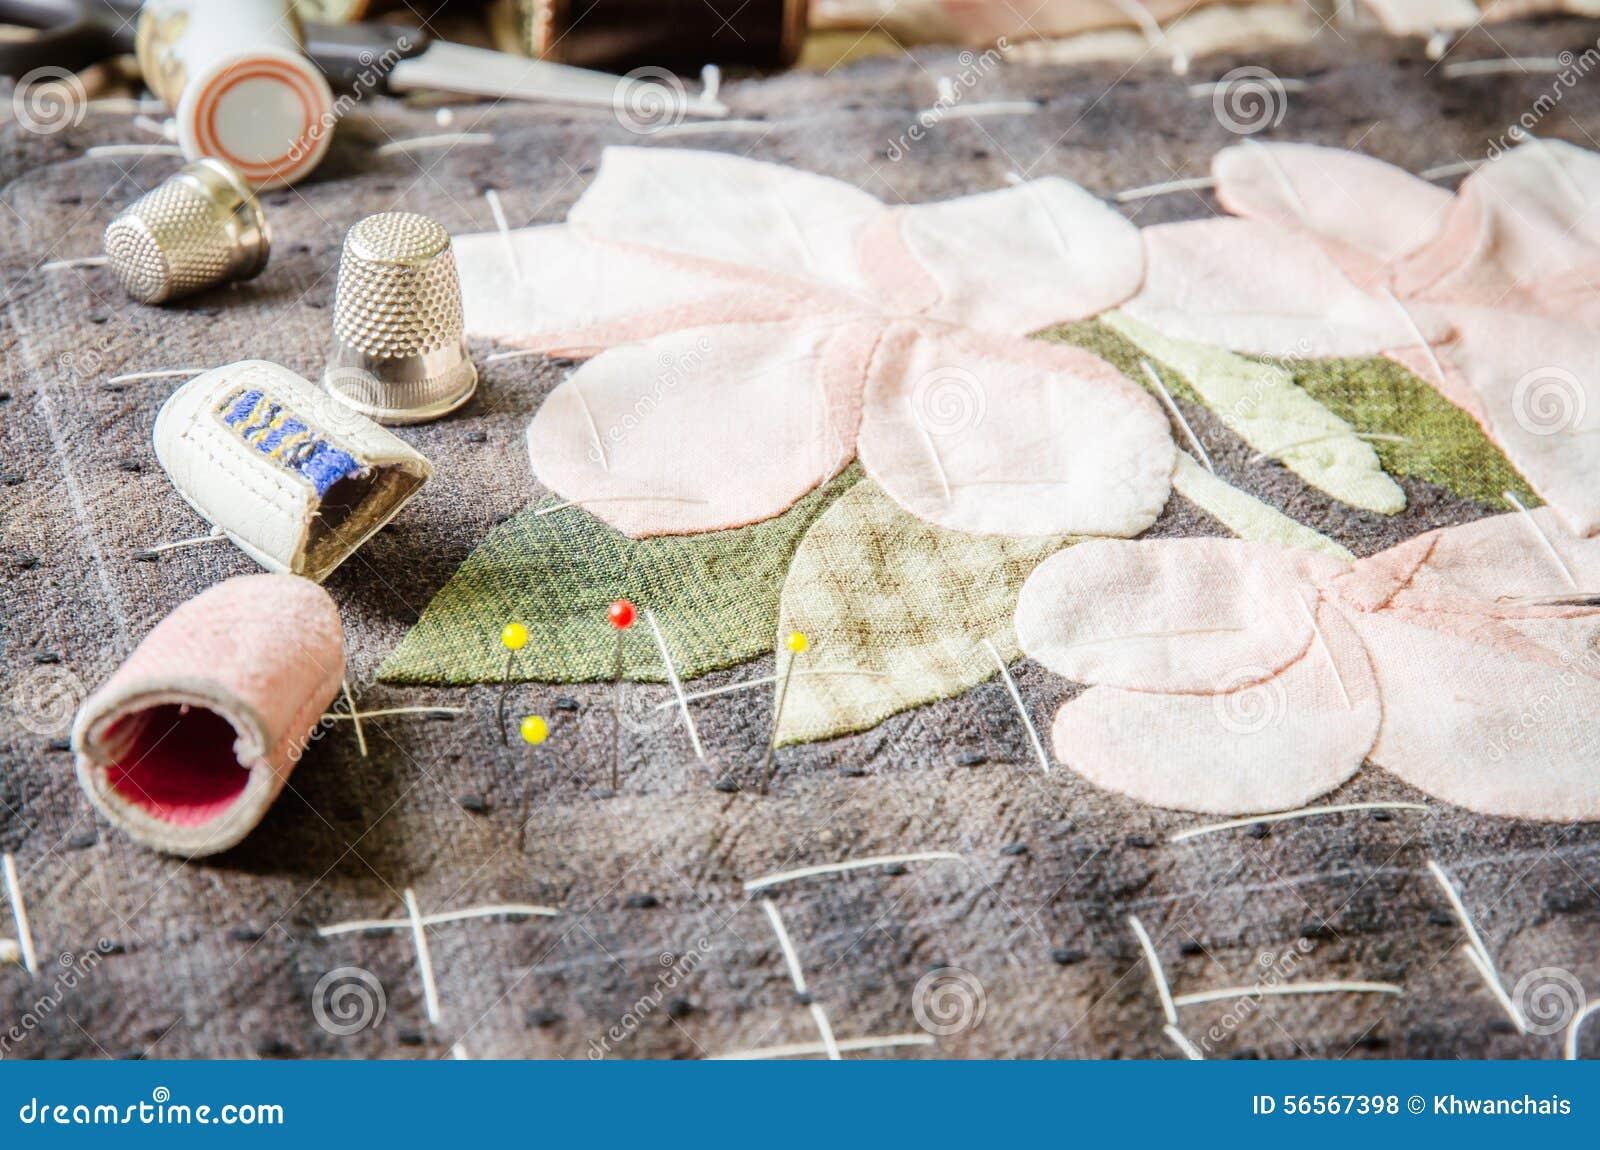 Download Προσαρμόζοντας εξαρτήματα χόμπι Ράβοντας εξάρτηση τεχνών, να γεμίσει Στοκ Εικόνες - εικόνα από λυγαριά, νήμα: 56567398